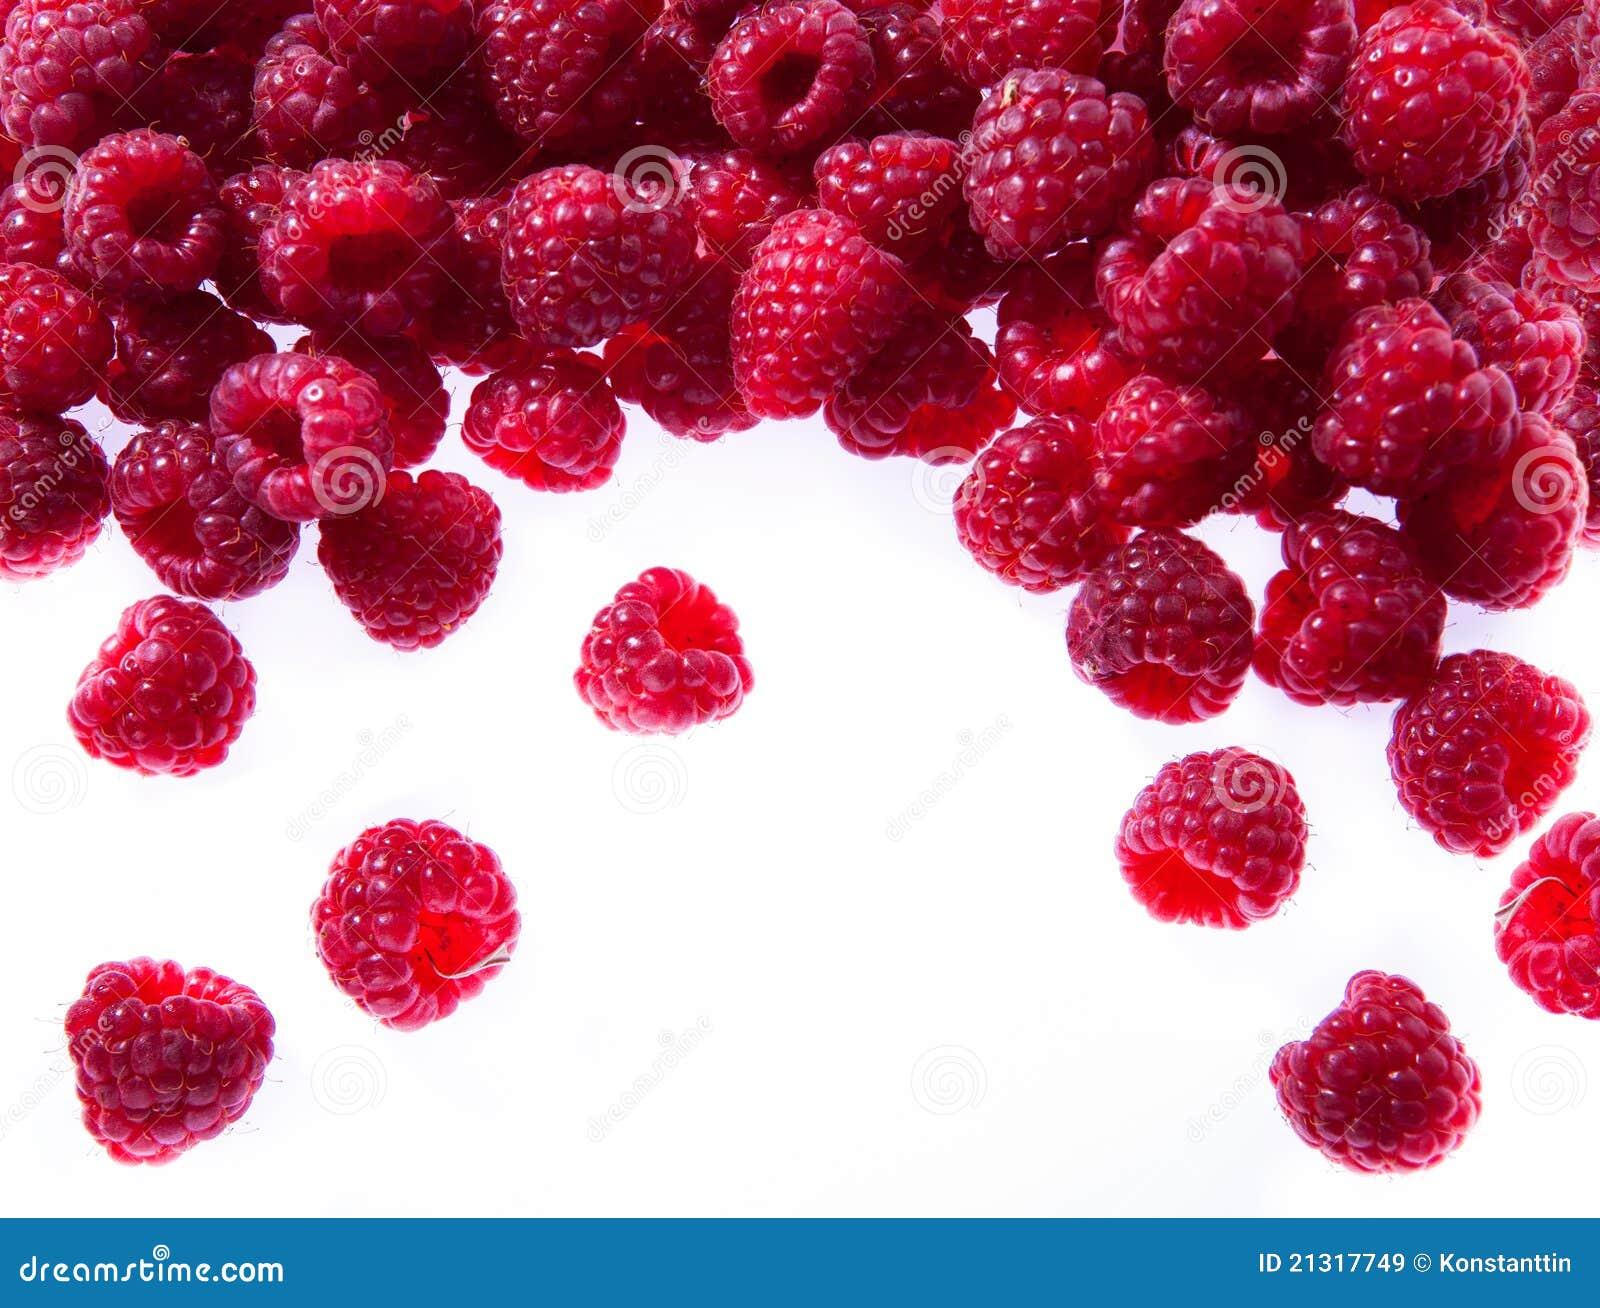 raspberry and white wallpaper - photo #14